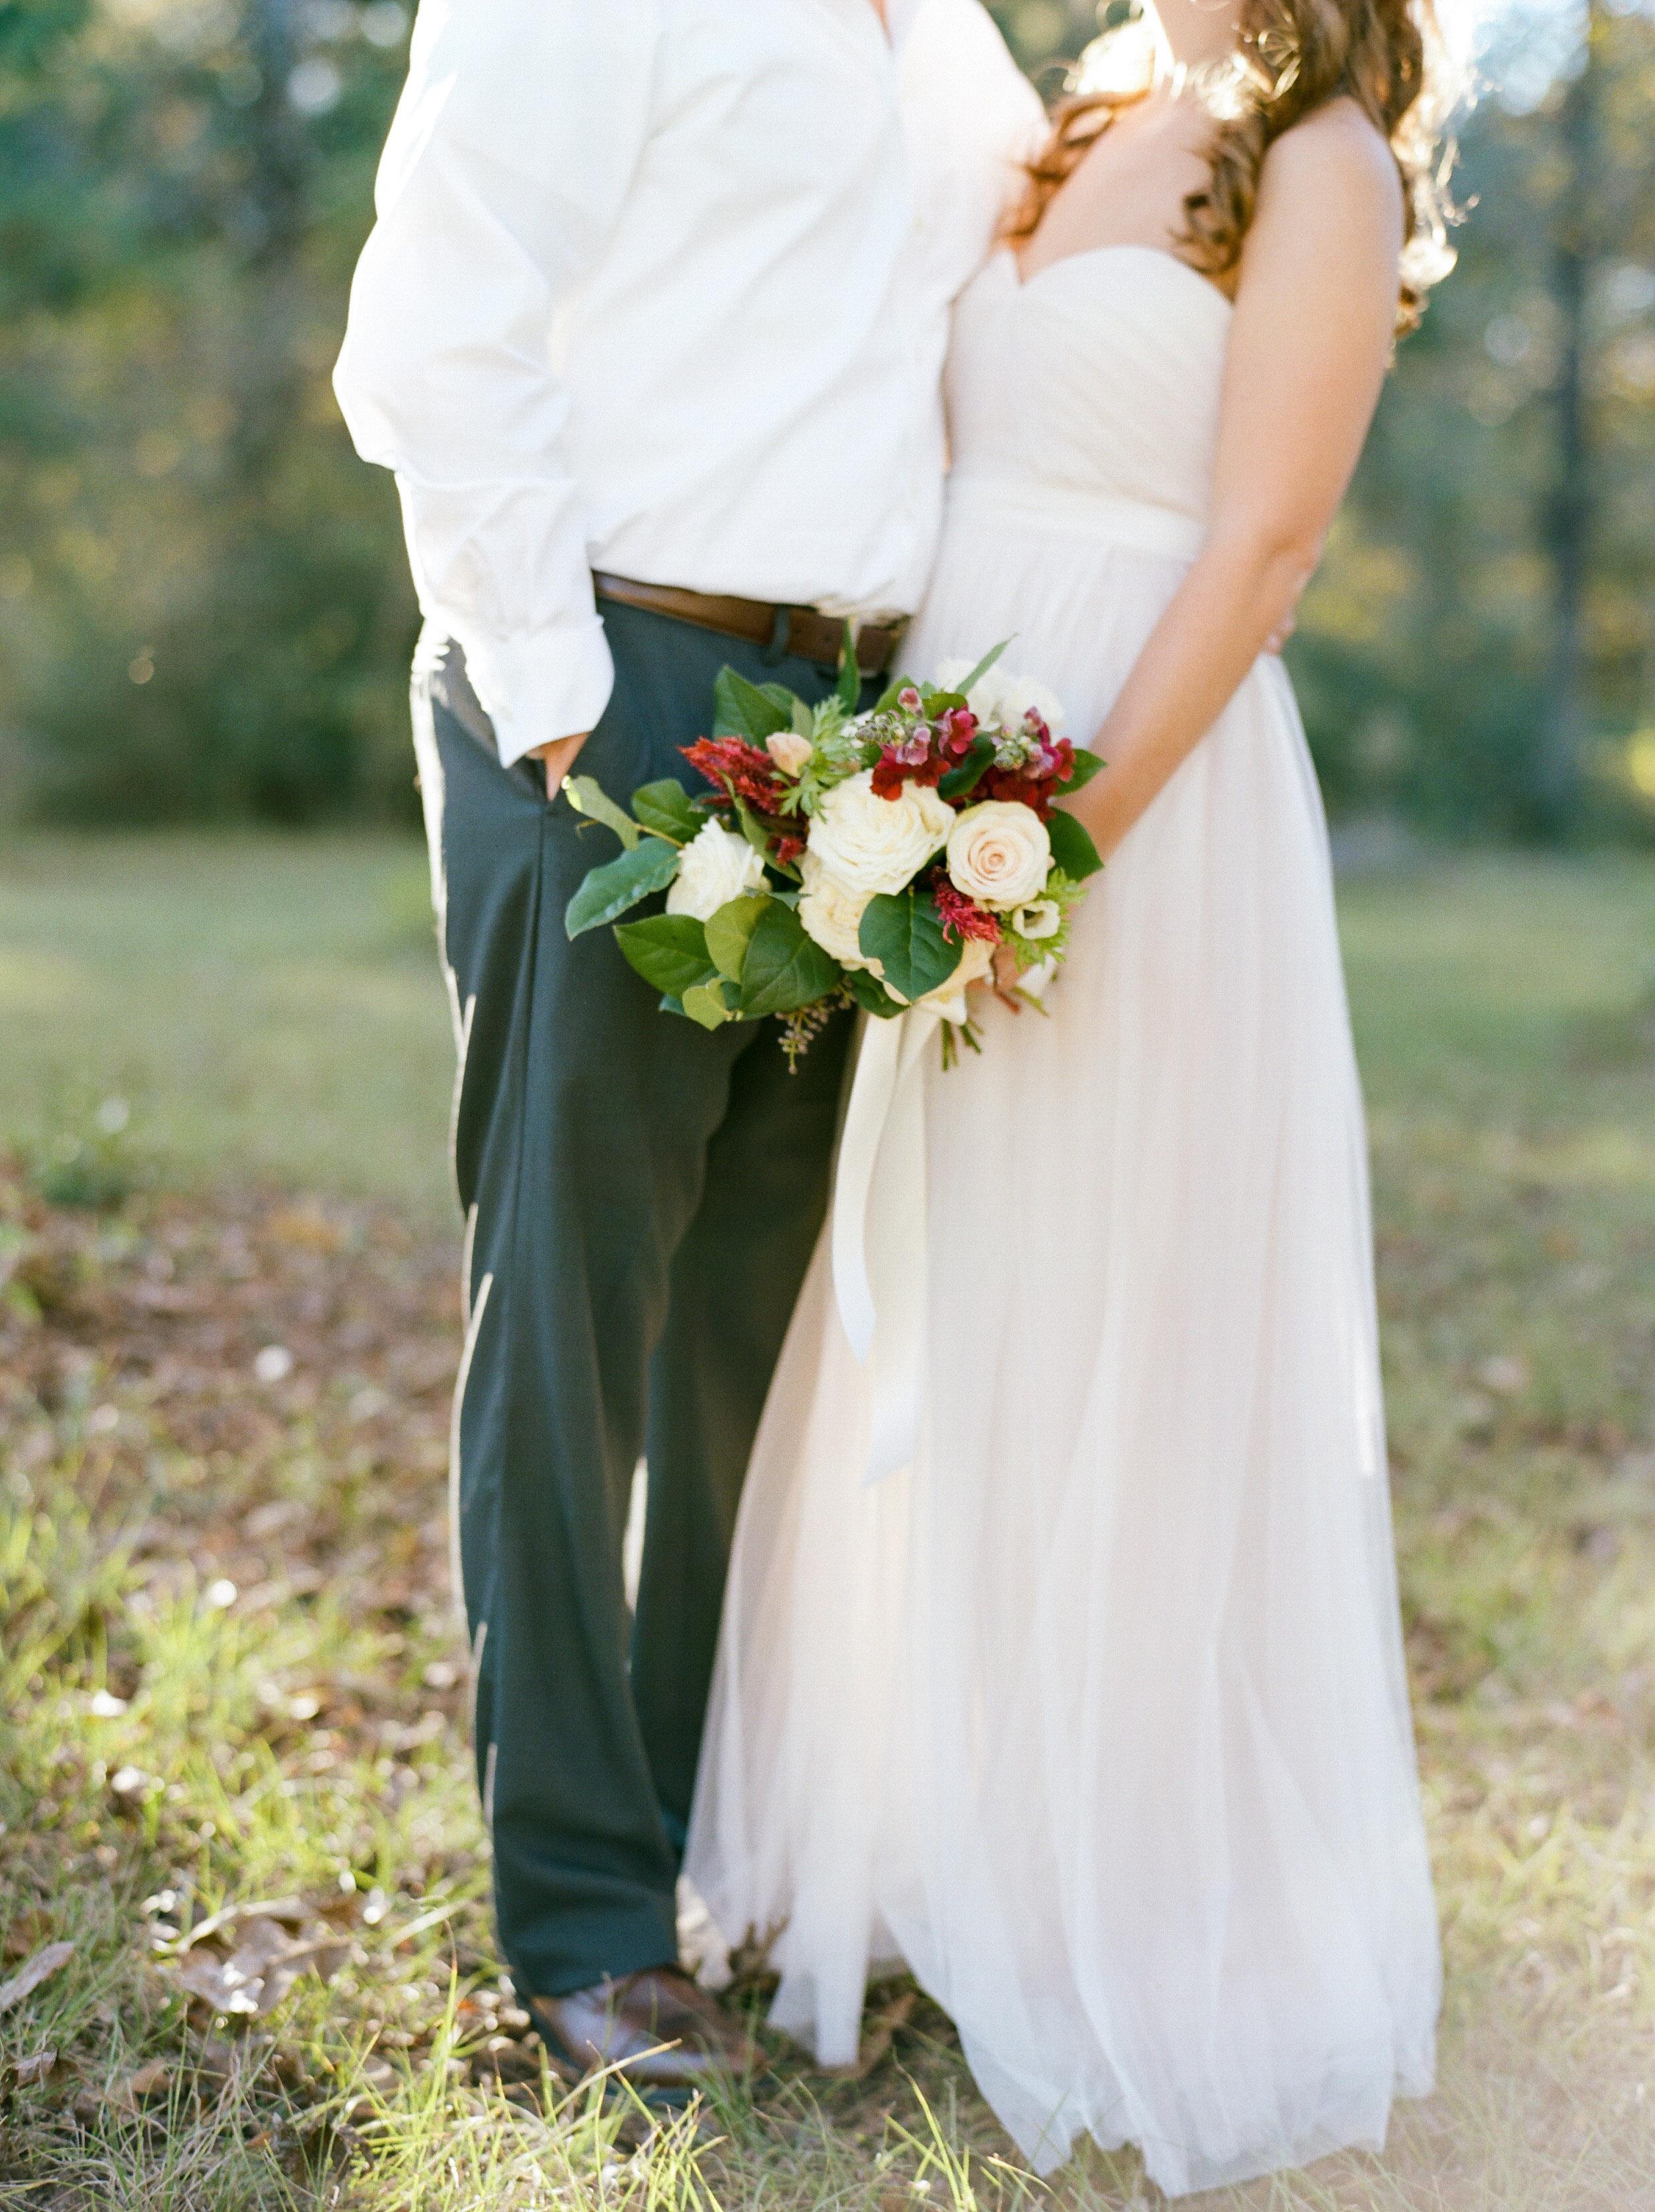 dana-fernandez-photography-houston-wedding-photographer-portraits-engagements-anniversary-session-film-photographer-austin-wedding-photographer-9.jpg